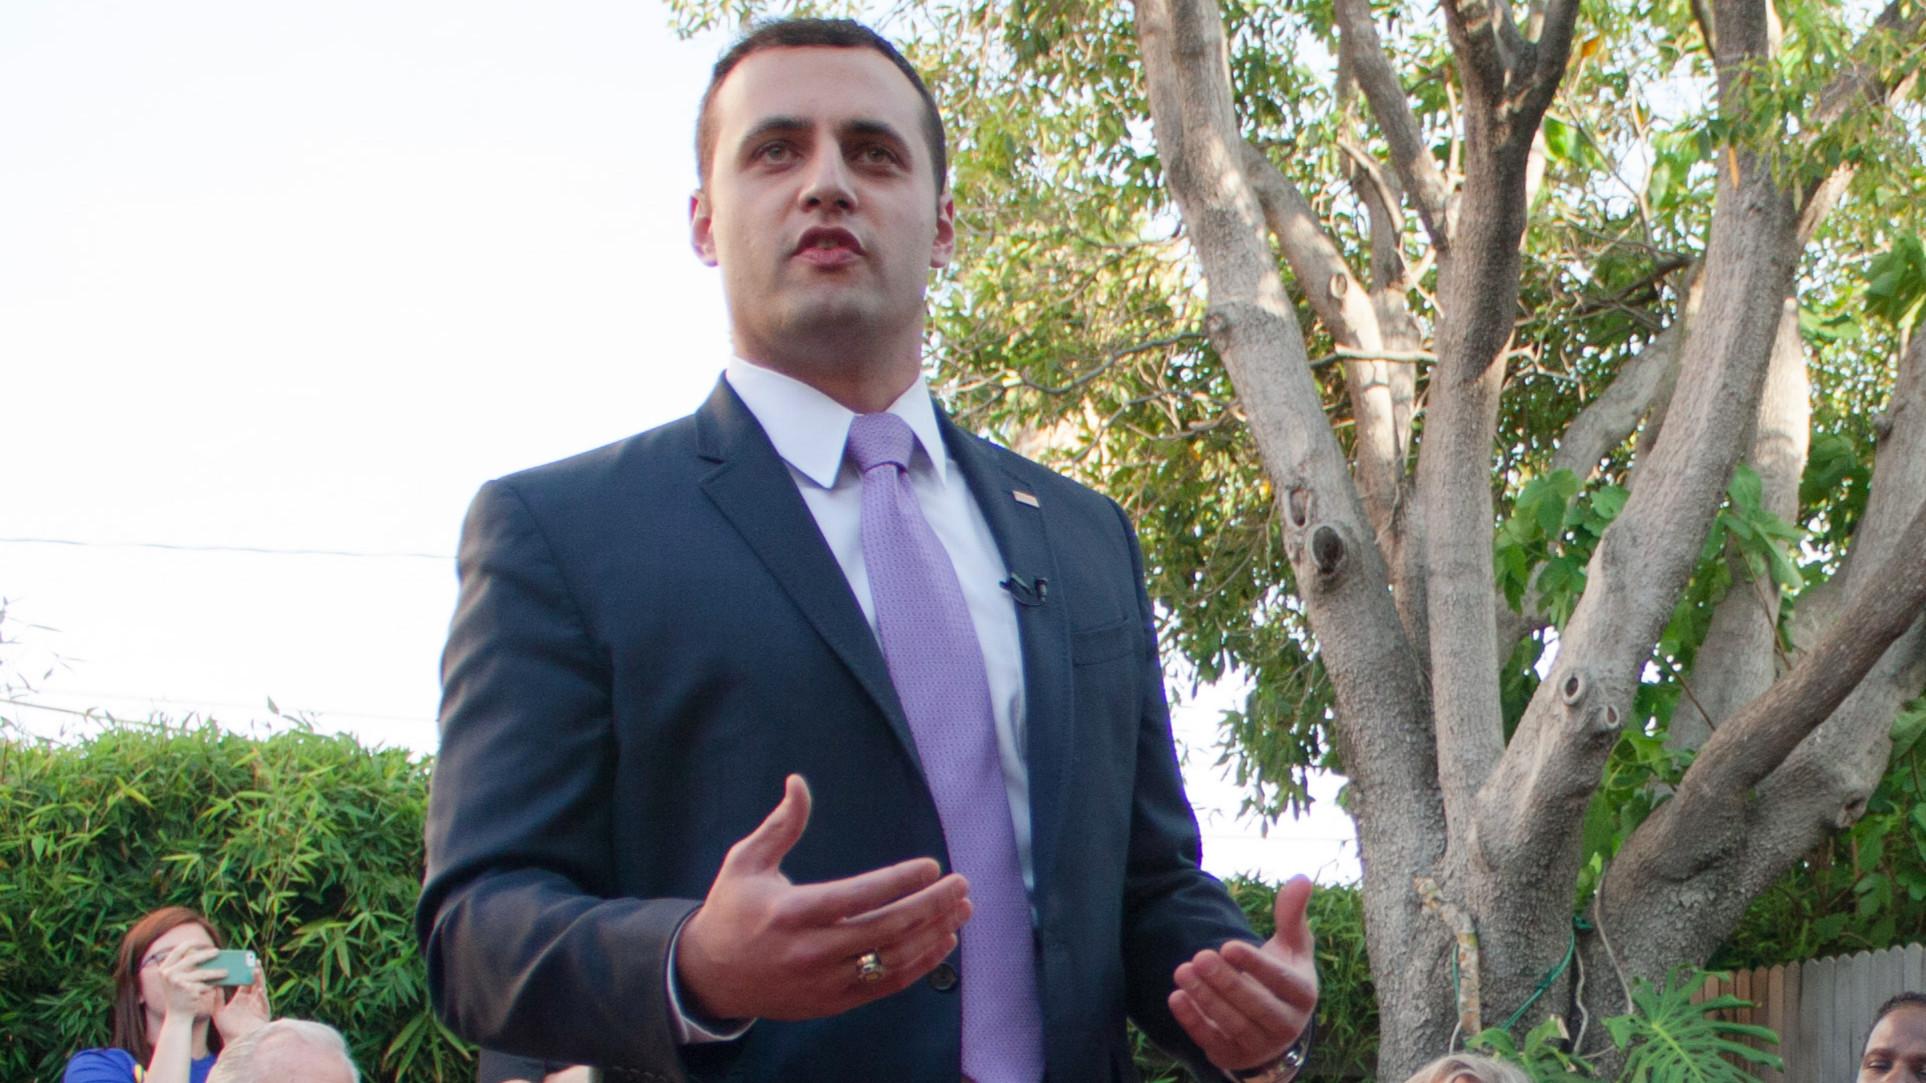 Republican Justin Fareed